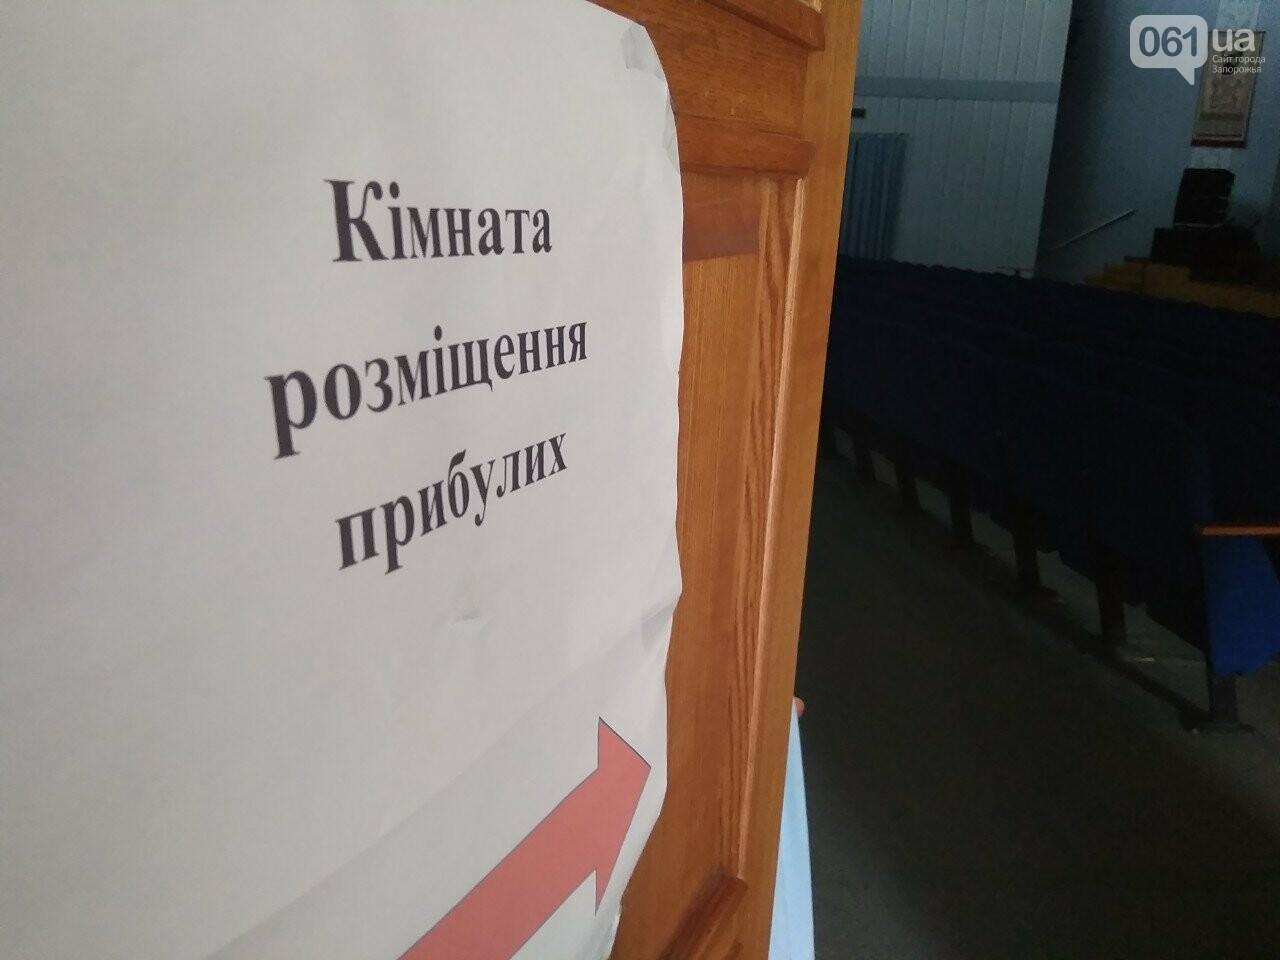 Запорожские спасатели провели учения на территории воинской части: по легенде, горел склад с боеприпасами, фото-2